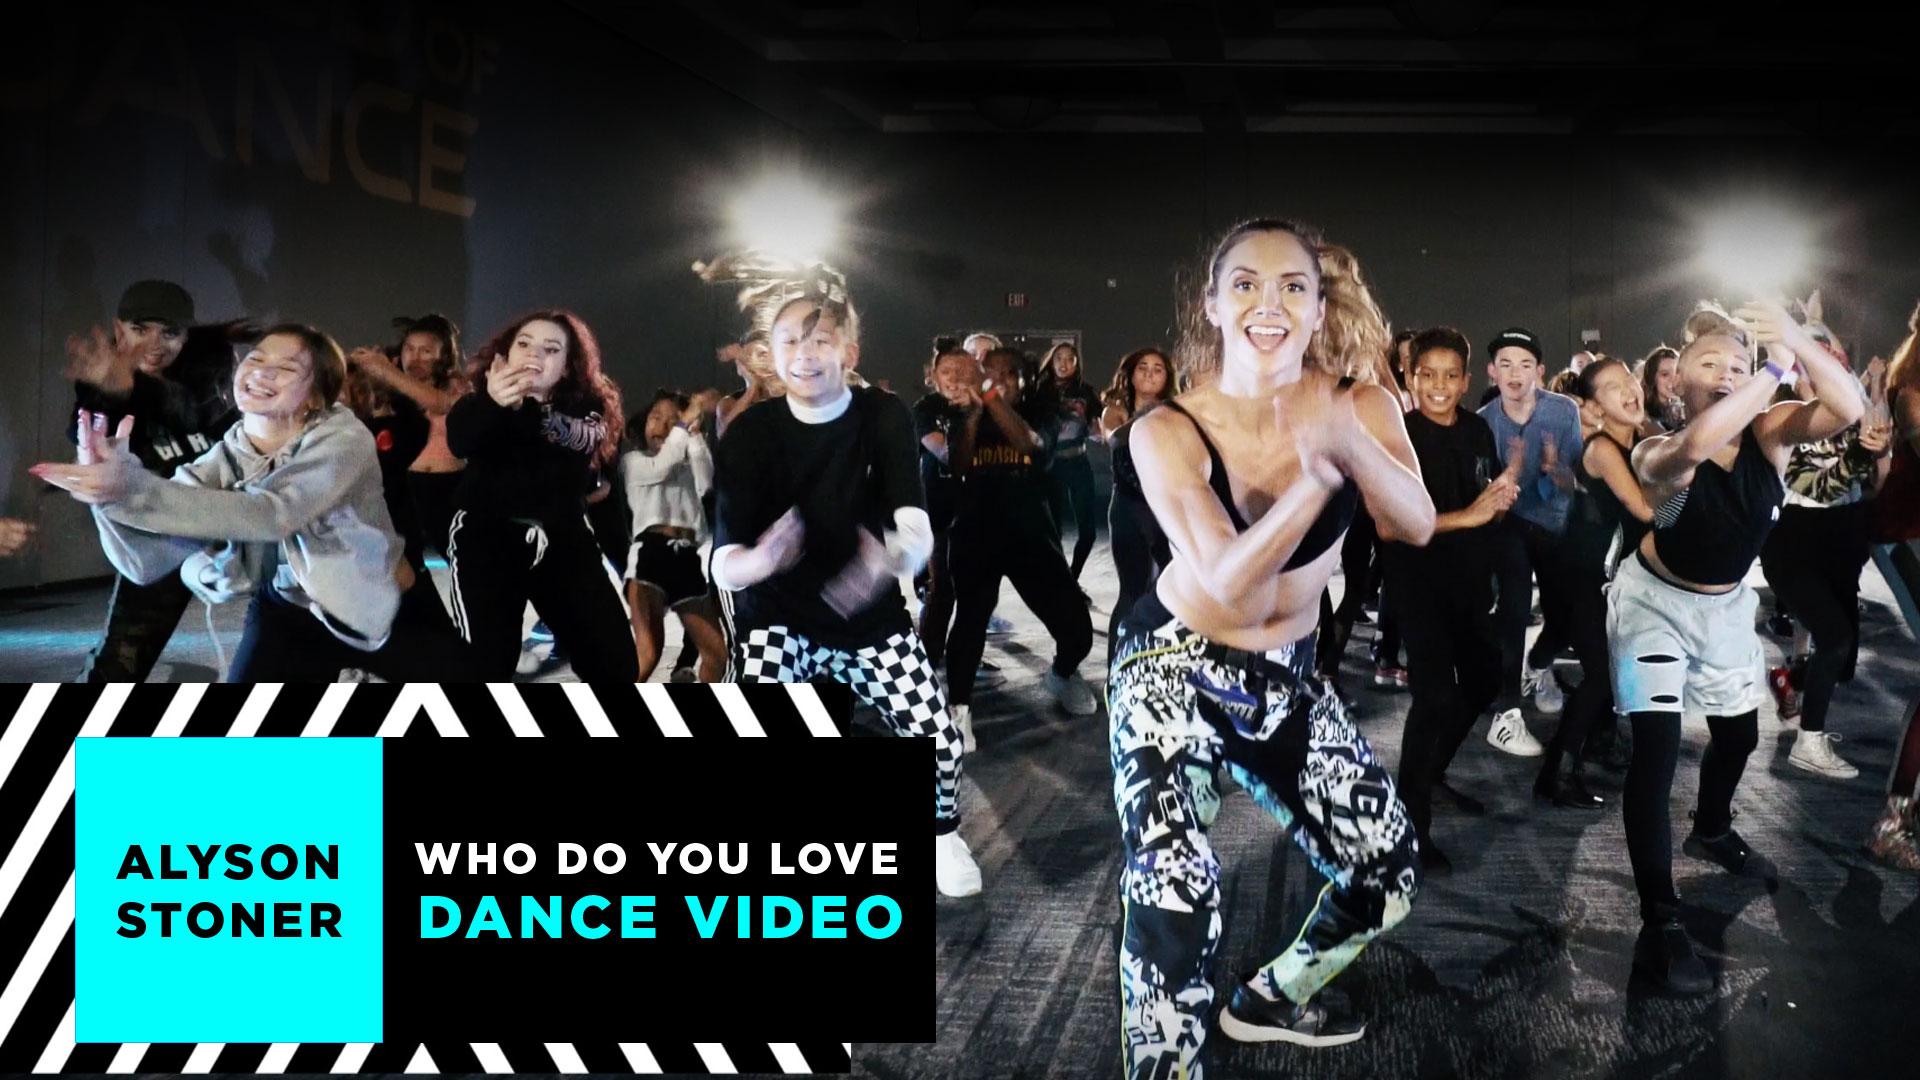 alyson-stoner-dance-video-1920x1080.jpg